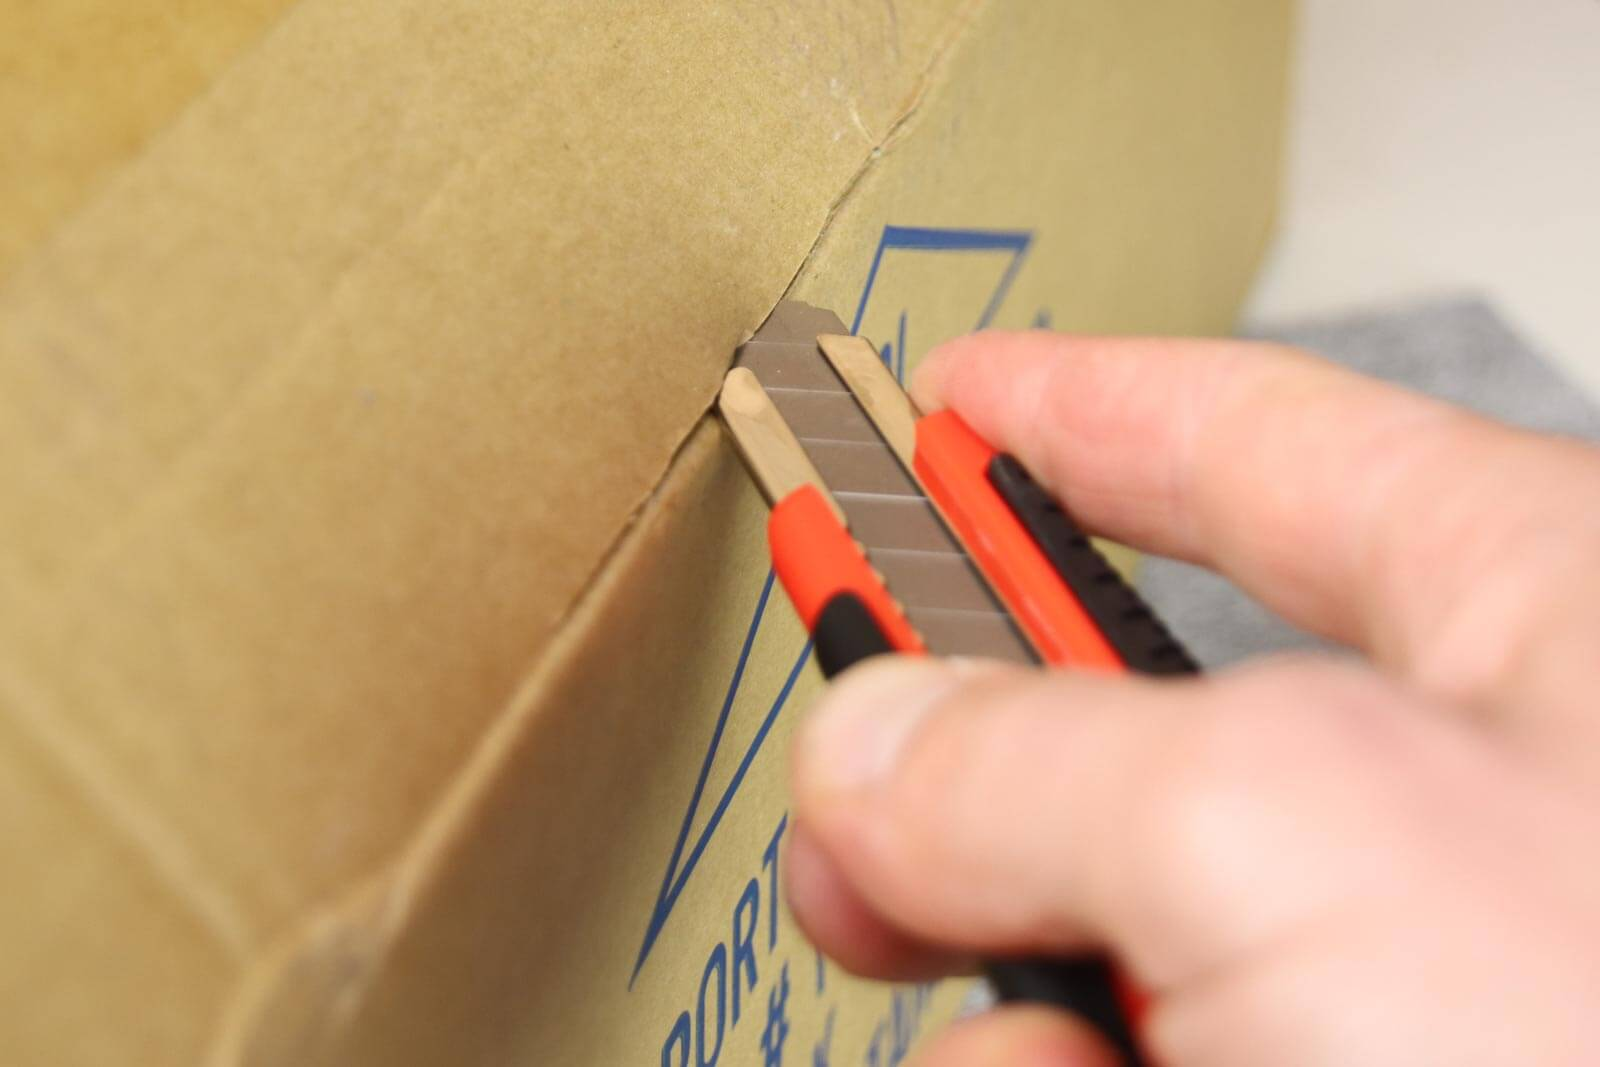 C062-Cuttermesser-18-mm-Basic-Karton-CURT-tools_1600